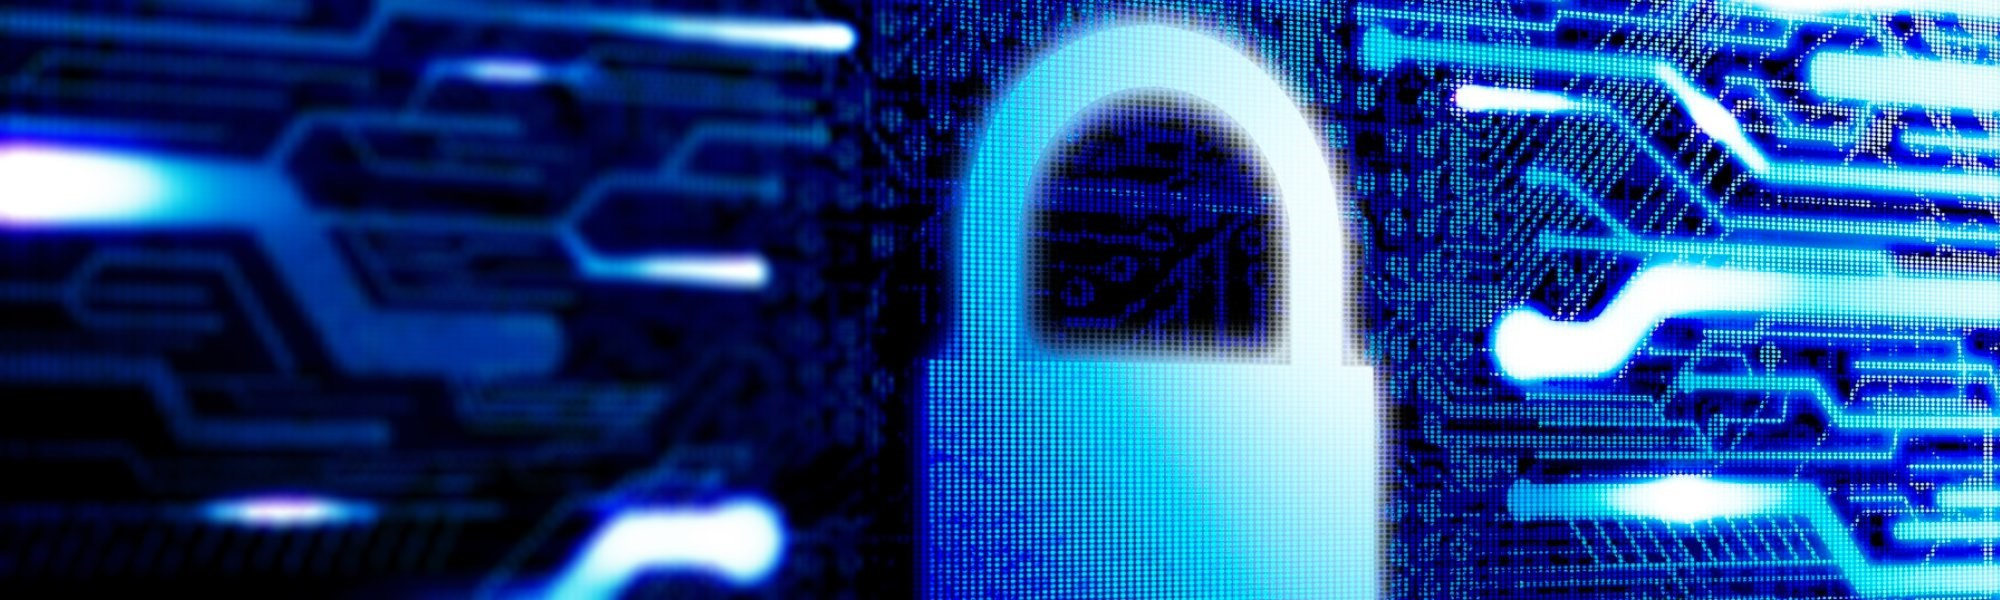 Certificate in information security risk management uw skip to main content xflitez Gallery